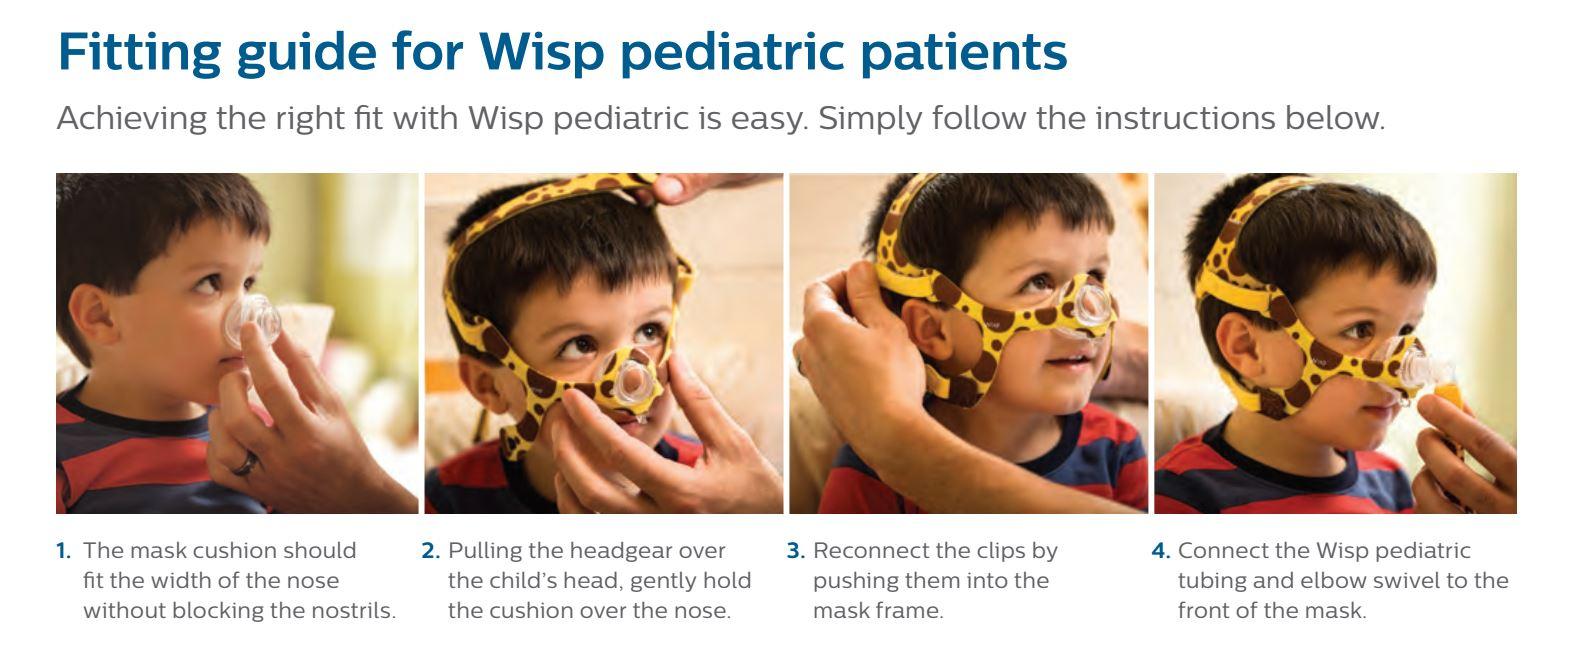 Wisp Paediatric Child Nasal Mask Hope 2 Sleep